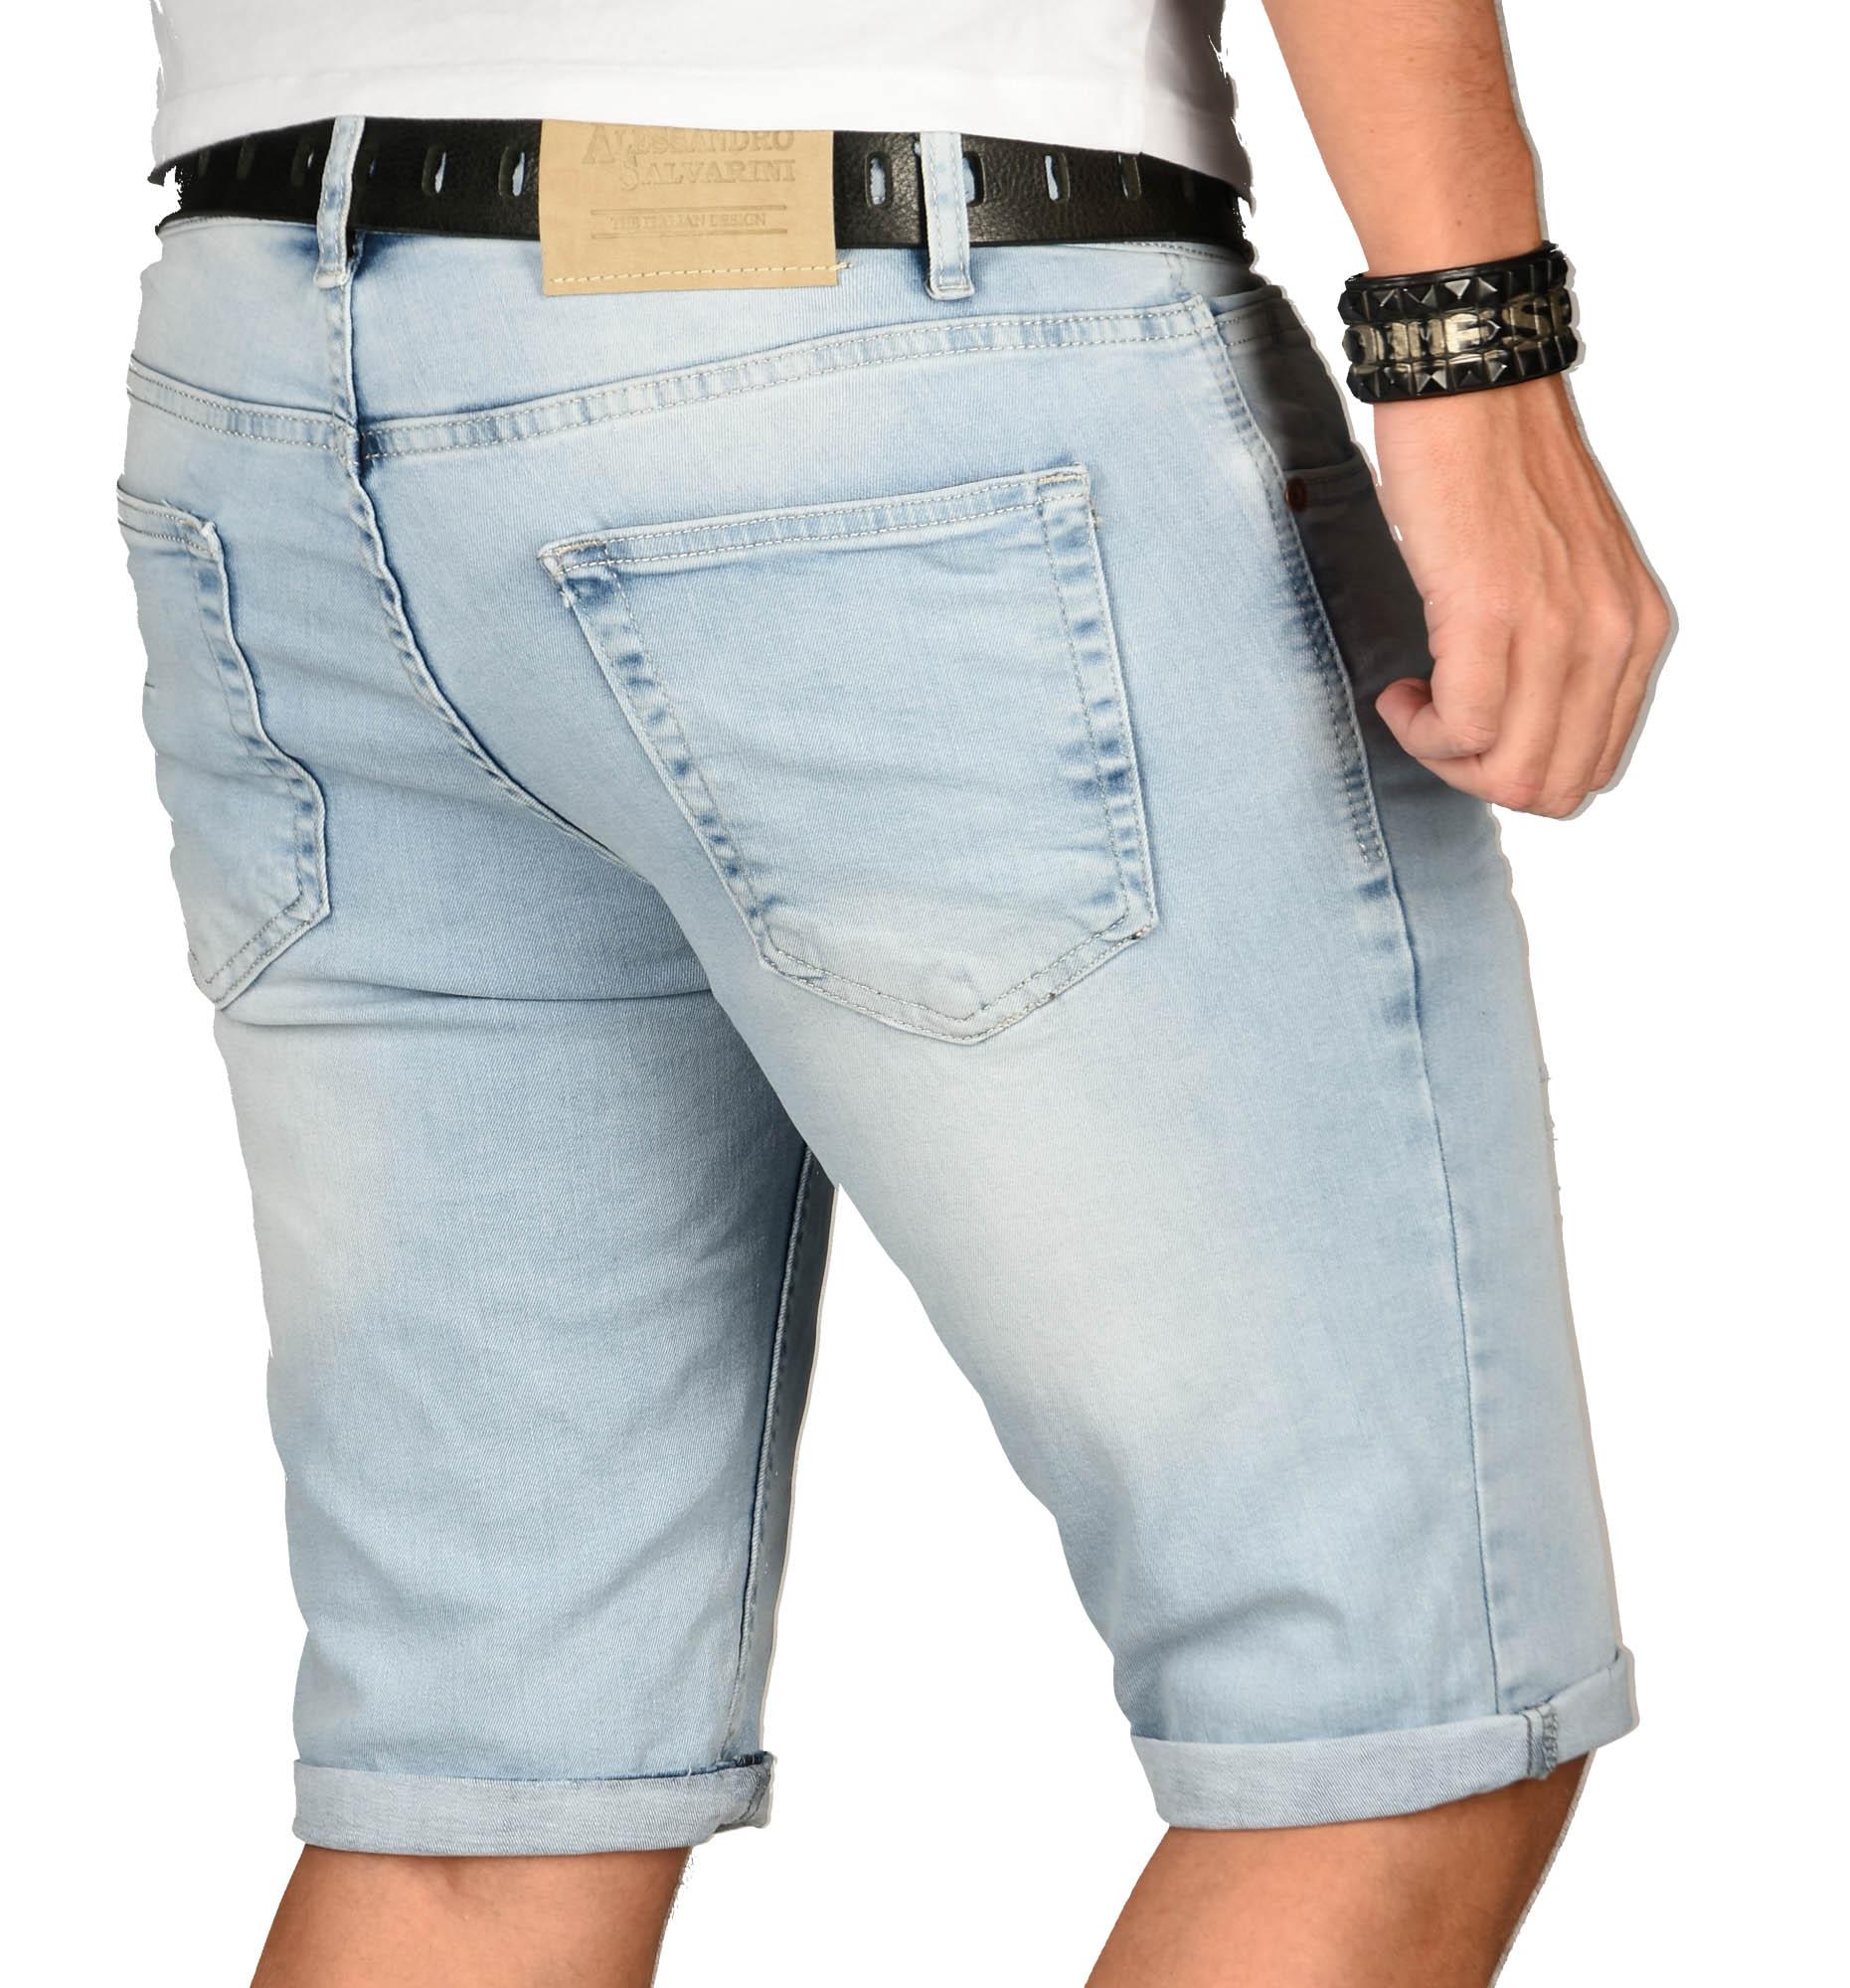 A-Salvarini-Herren-Designer-Jeans-Short-kurze-Hose-Slim-Sommer-Shorts-Washed Indexbild 8